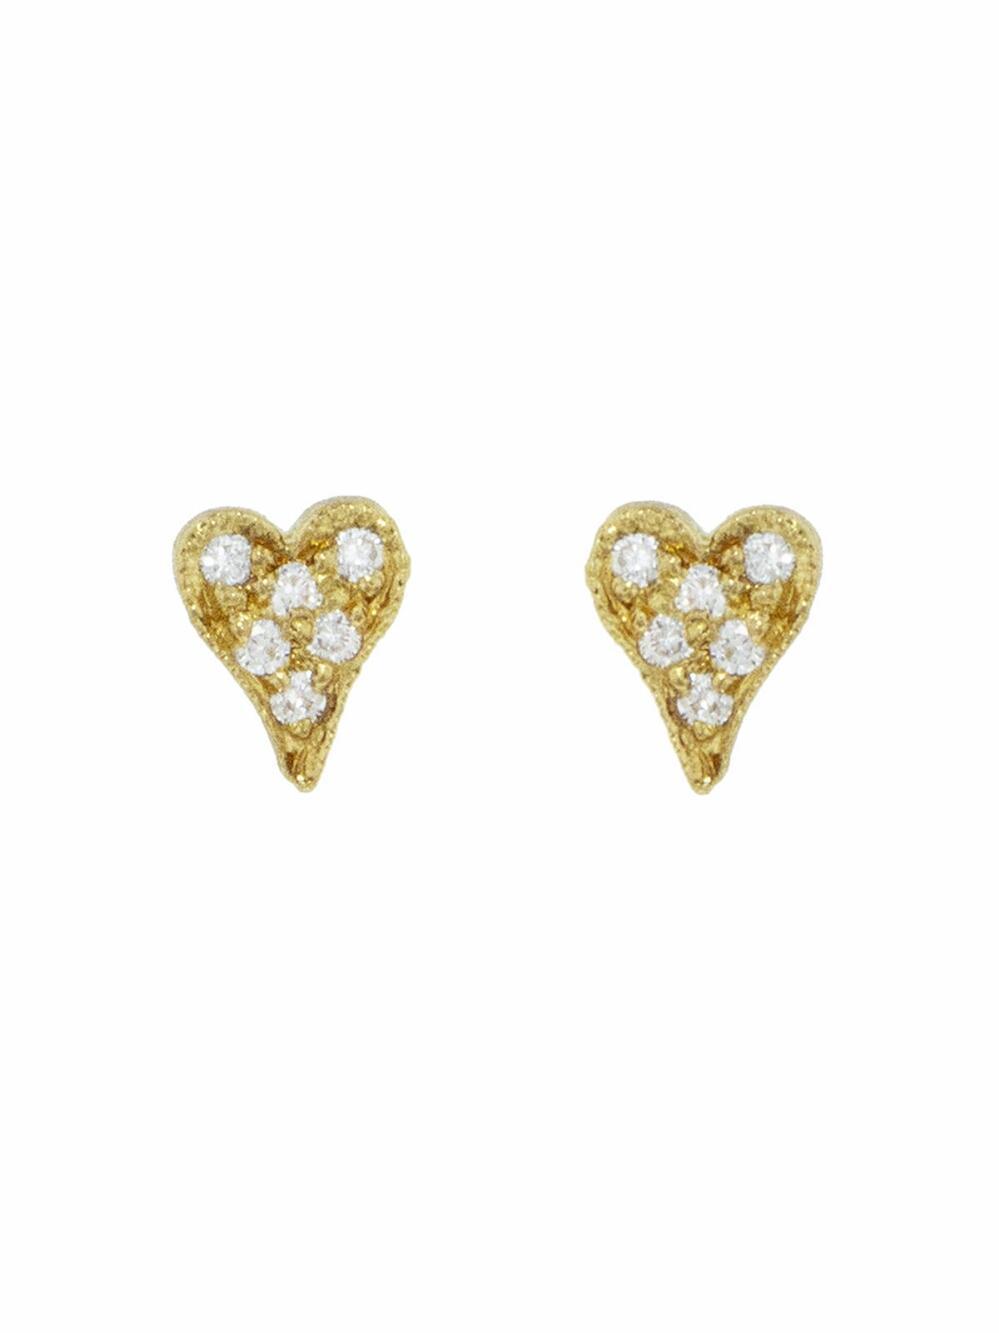 2da2a6f91fad7 Lyst - Cathy Waterman Diamond Tiny Heart Stud Earrings in Metallic